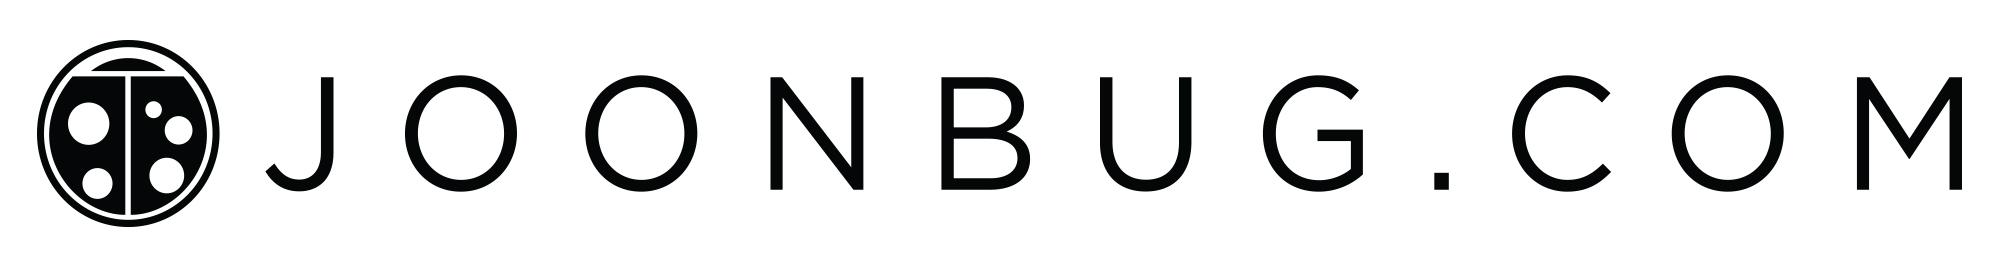 Joonbug.com-Logo-Black.jpg